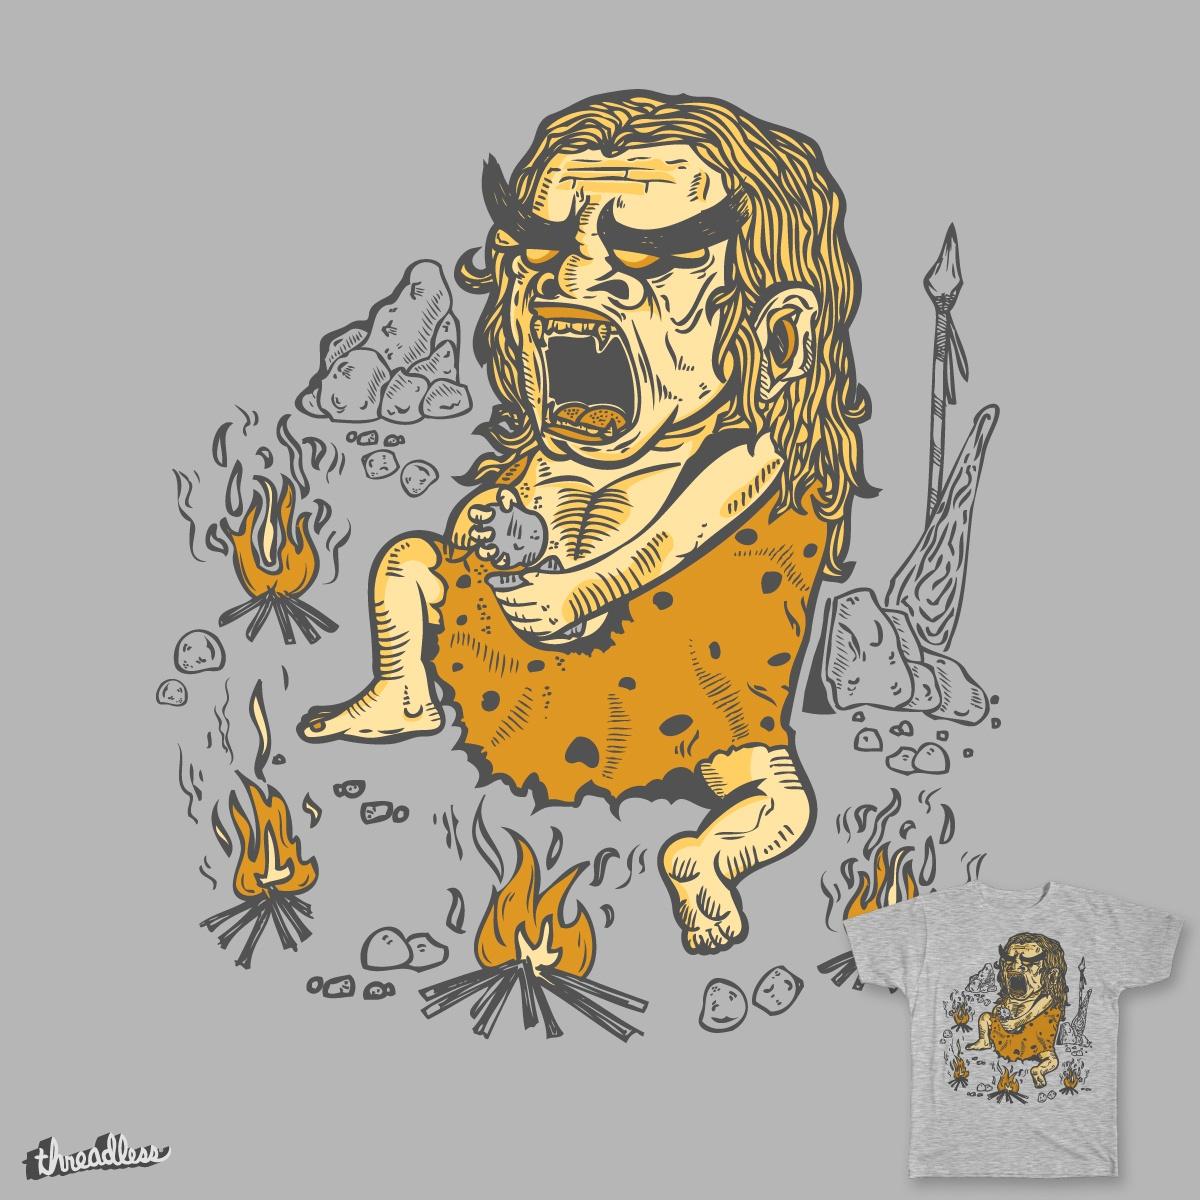 Prehistoric Pyromaniac by Timo_Ambo on Threadless